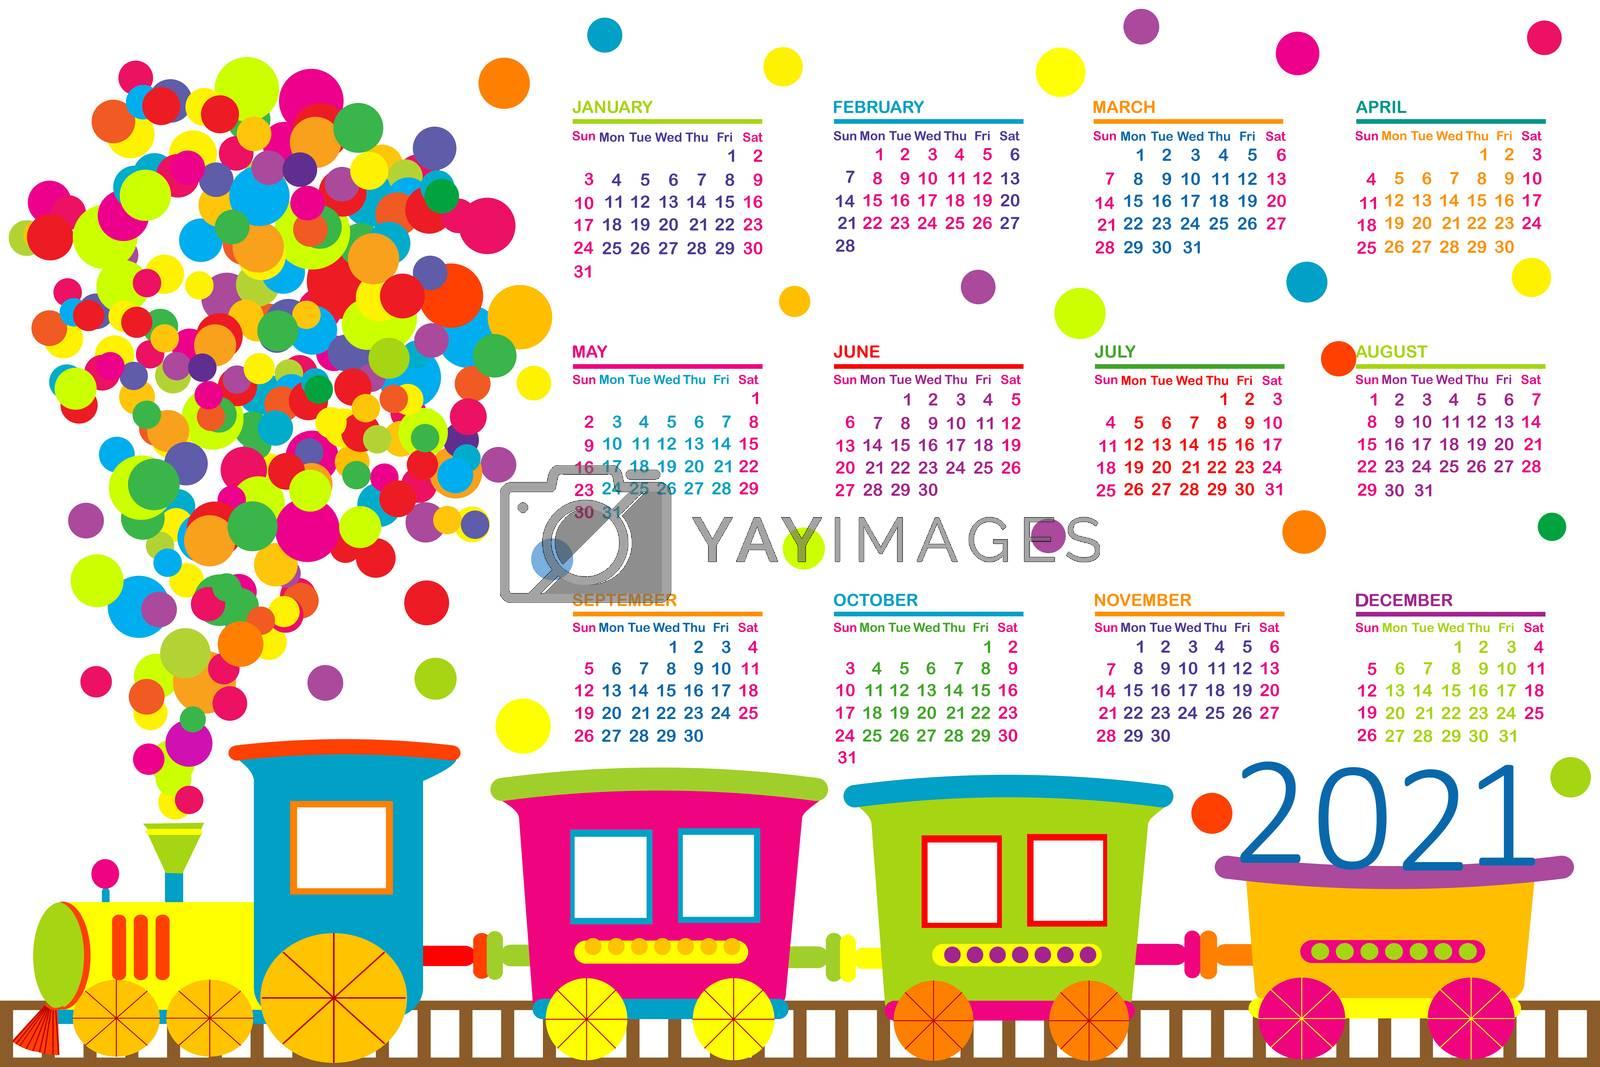 2021 calendar with train toy